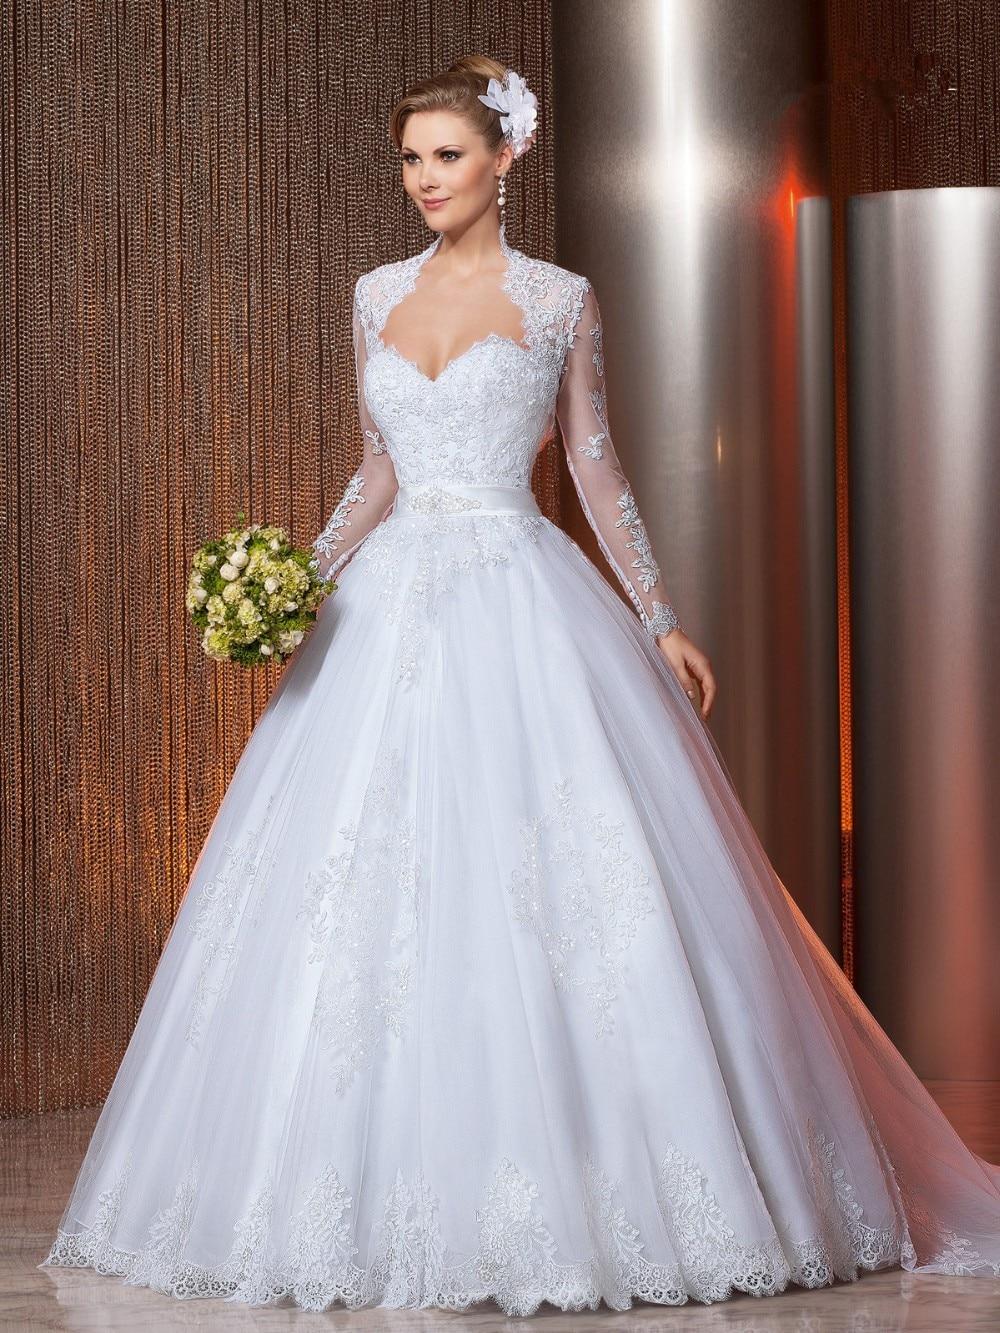 Aliexpress.com : Buy Long Sleeves Lace Wedding Dress Sweetheart ...